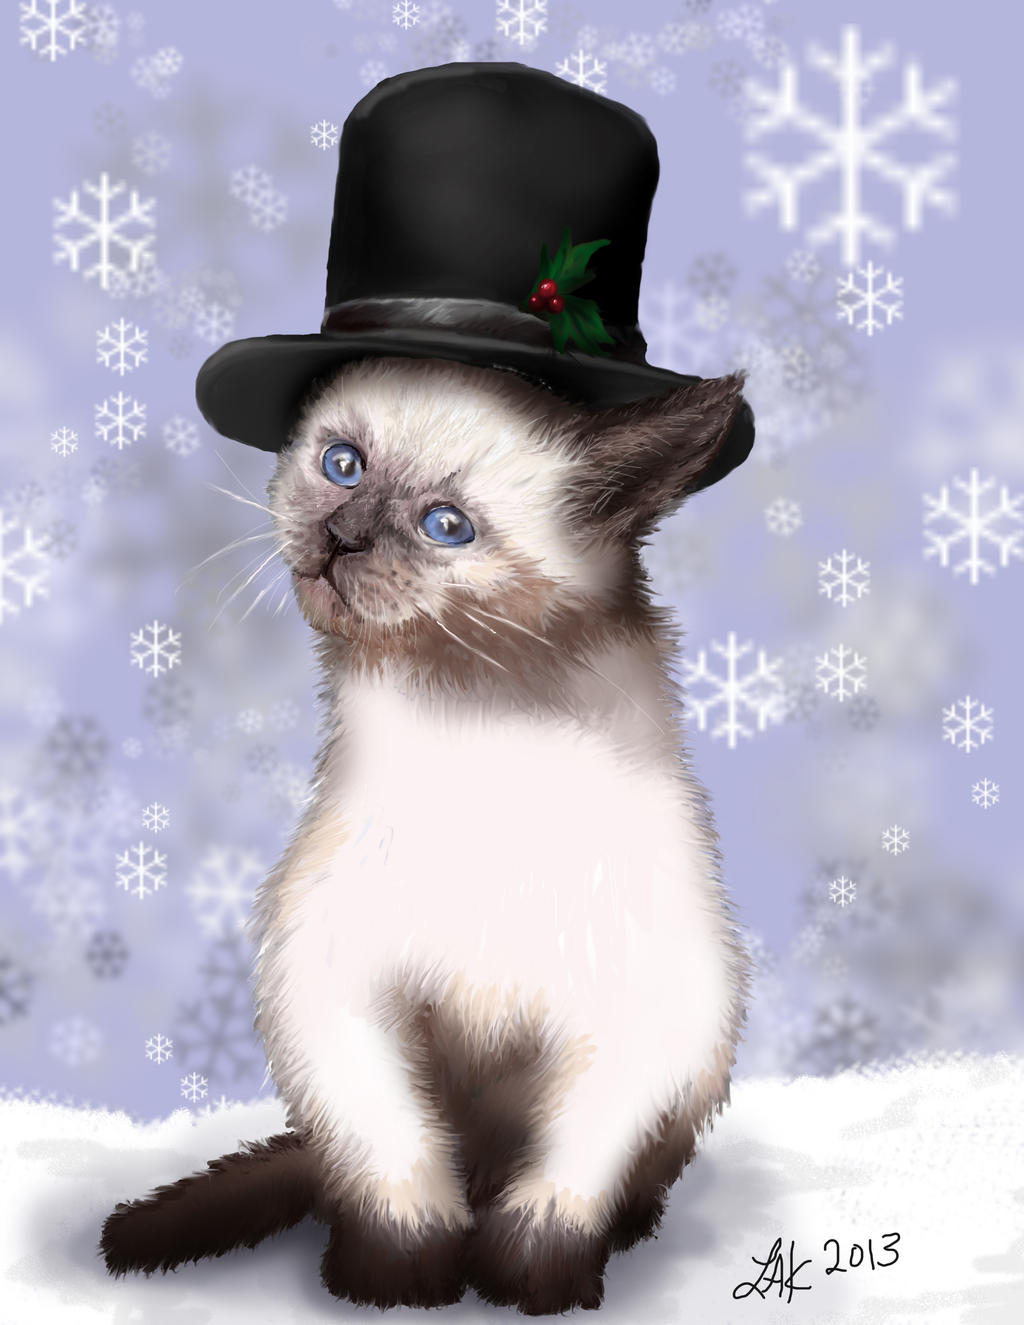 Merry Christmas 2012 by LeeAnneKortus